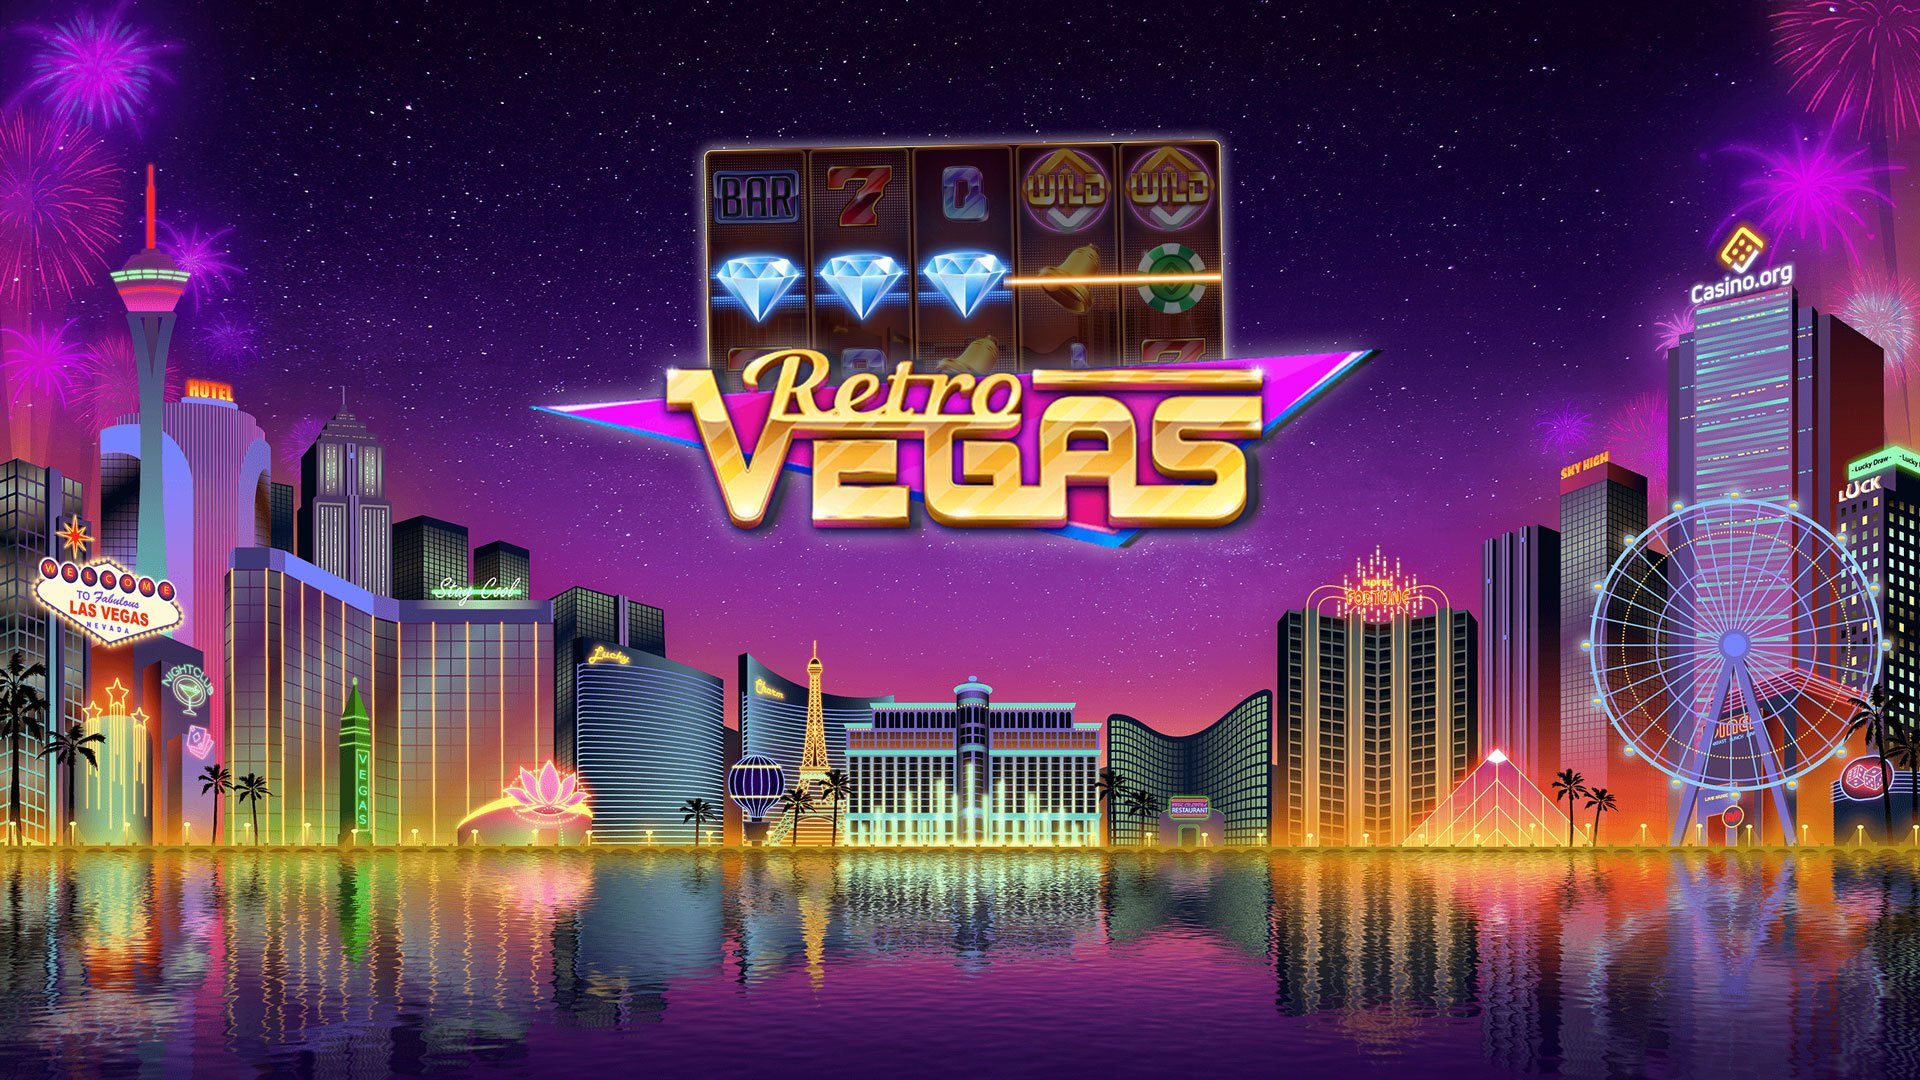 Retro Vegas slots game